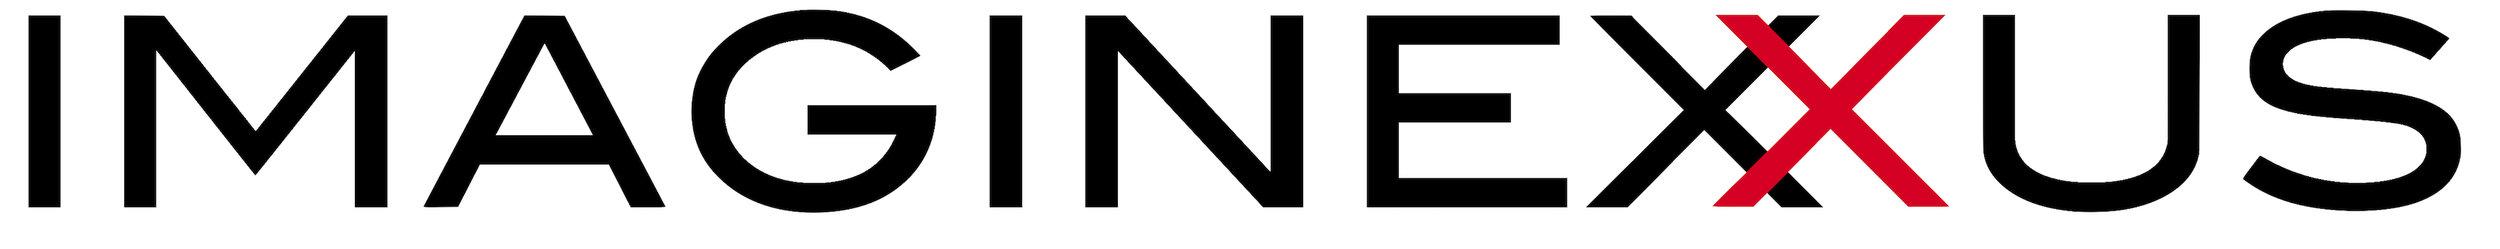 IXX logotrans 58.jpg